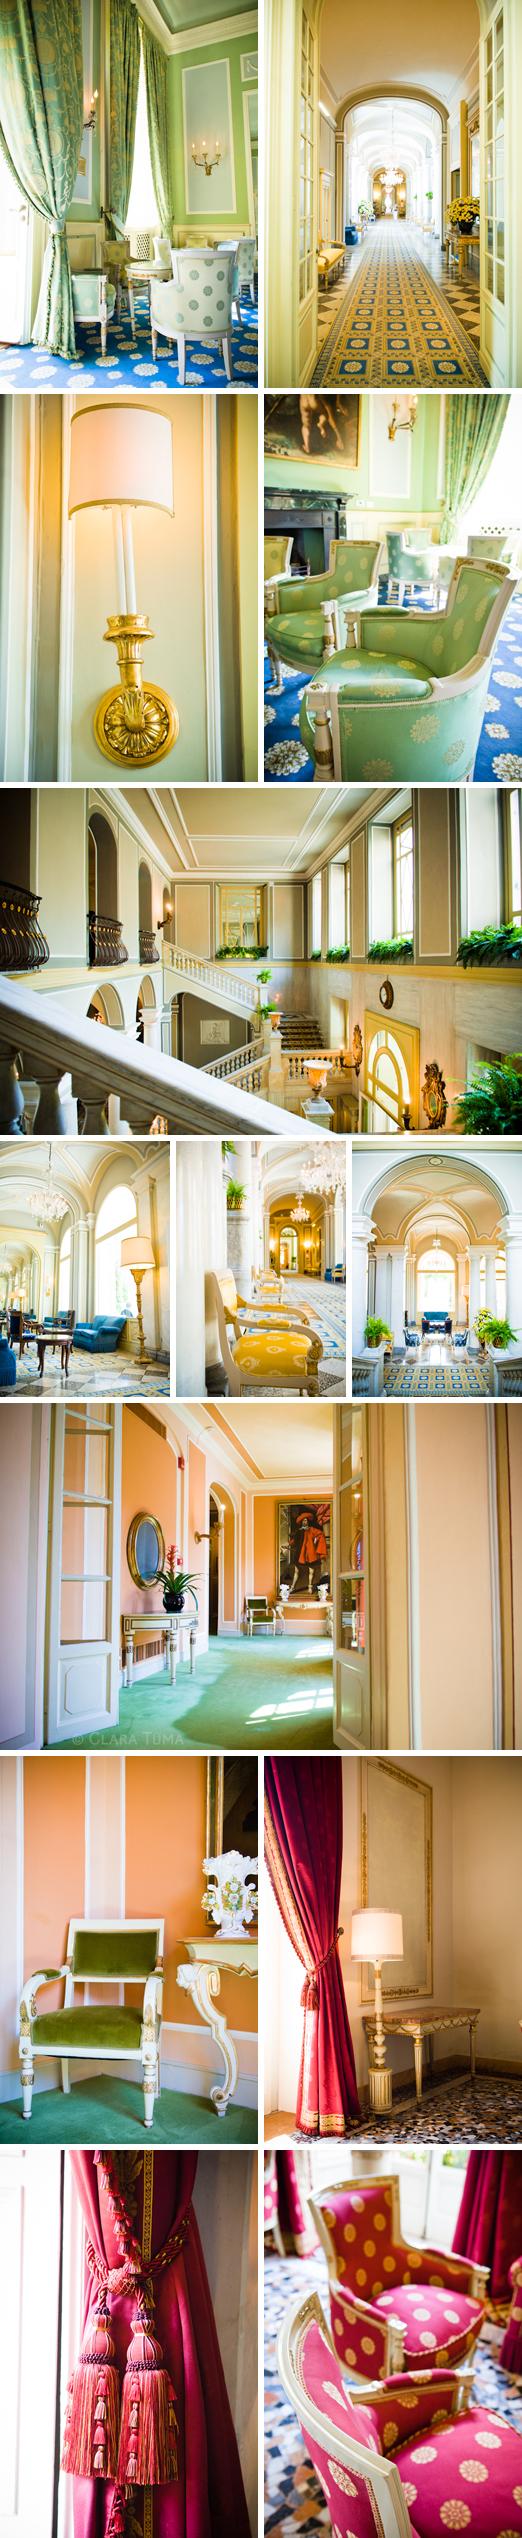 Villa-d'Este-Interior_©ClaraTuma.JPG